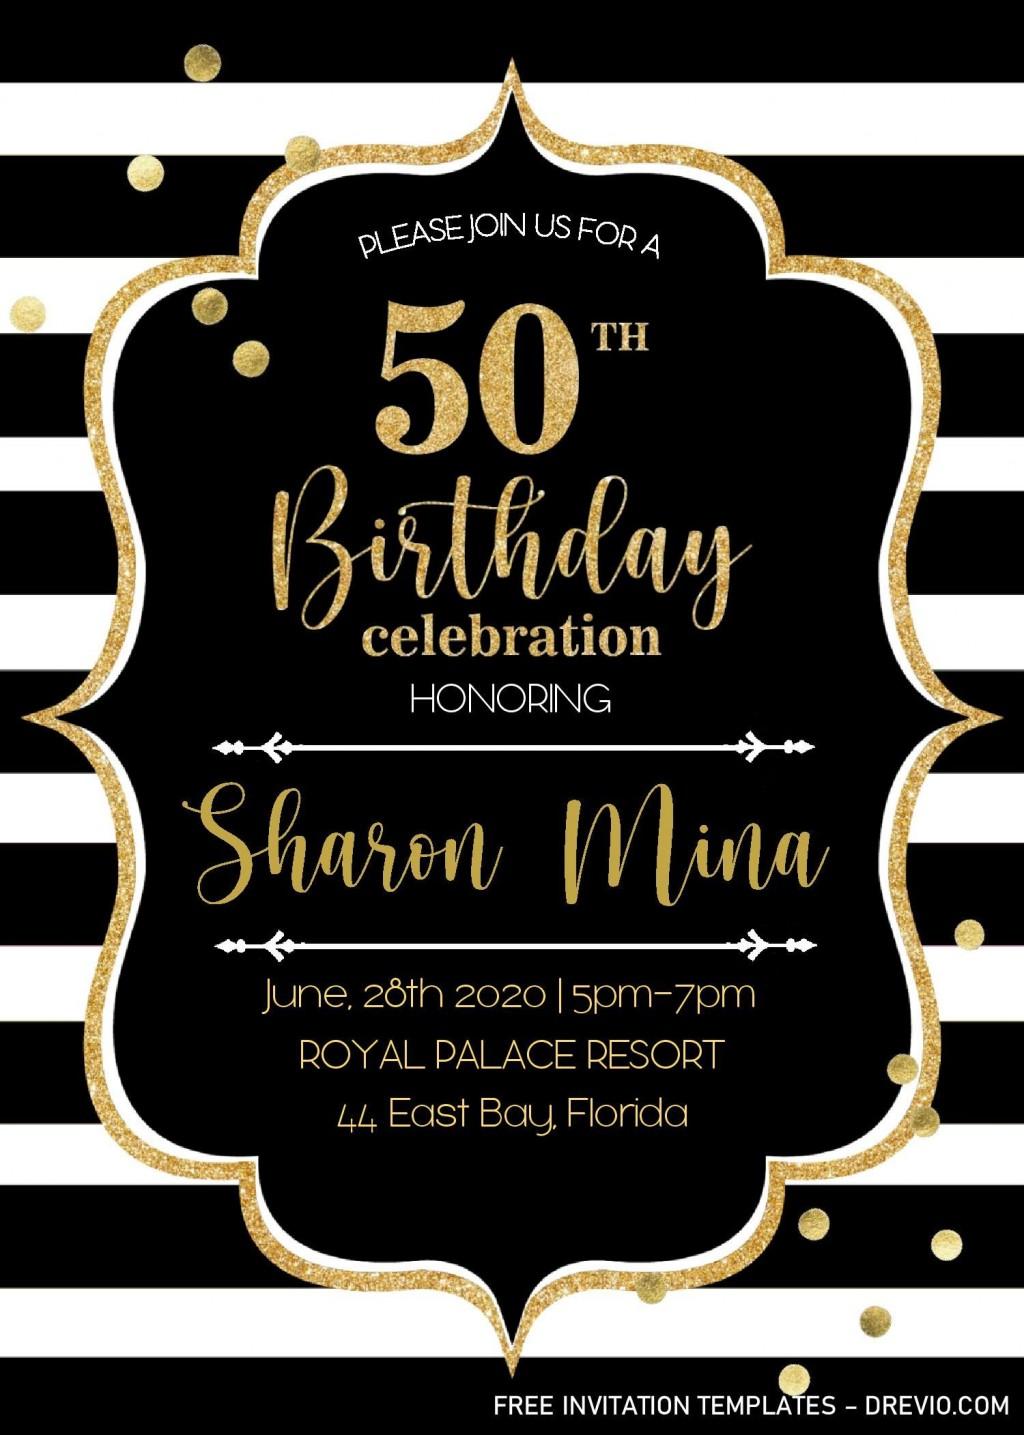 000 Striking 50th Wedding Anniversary Invitation Template Microsoft Word Image  FreeLarge